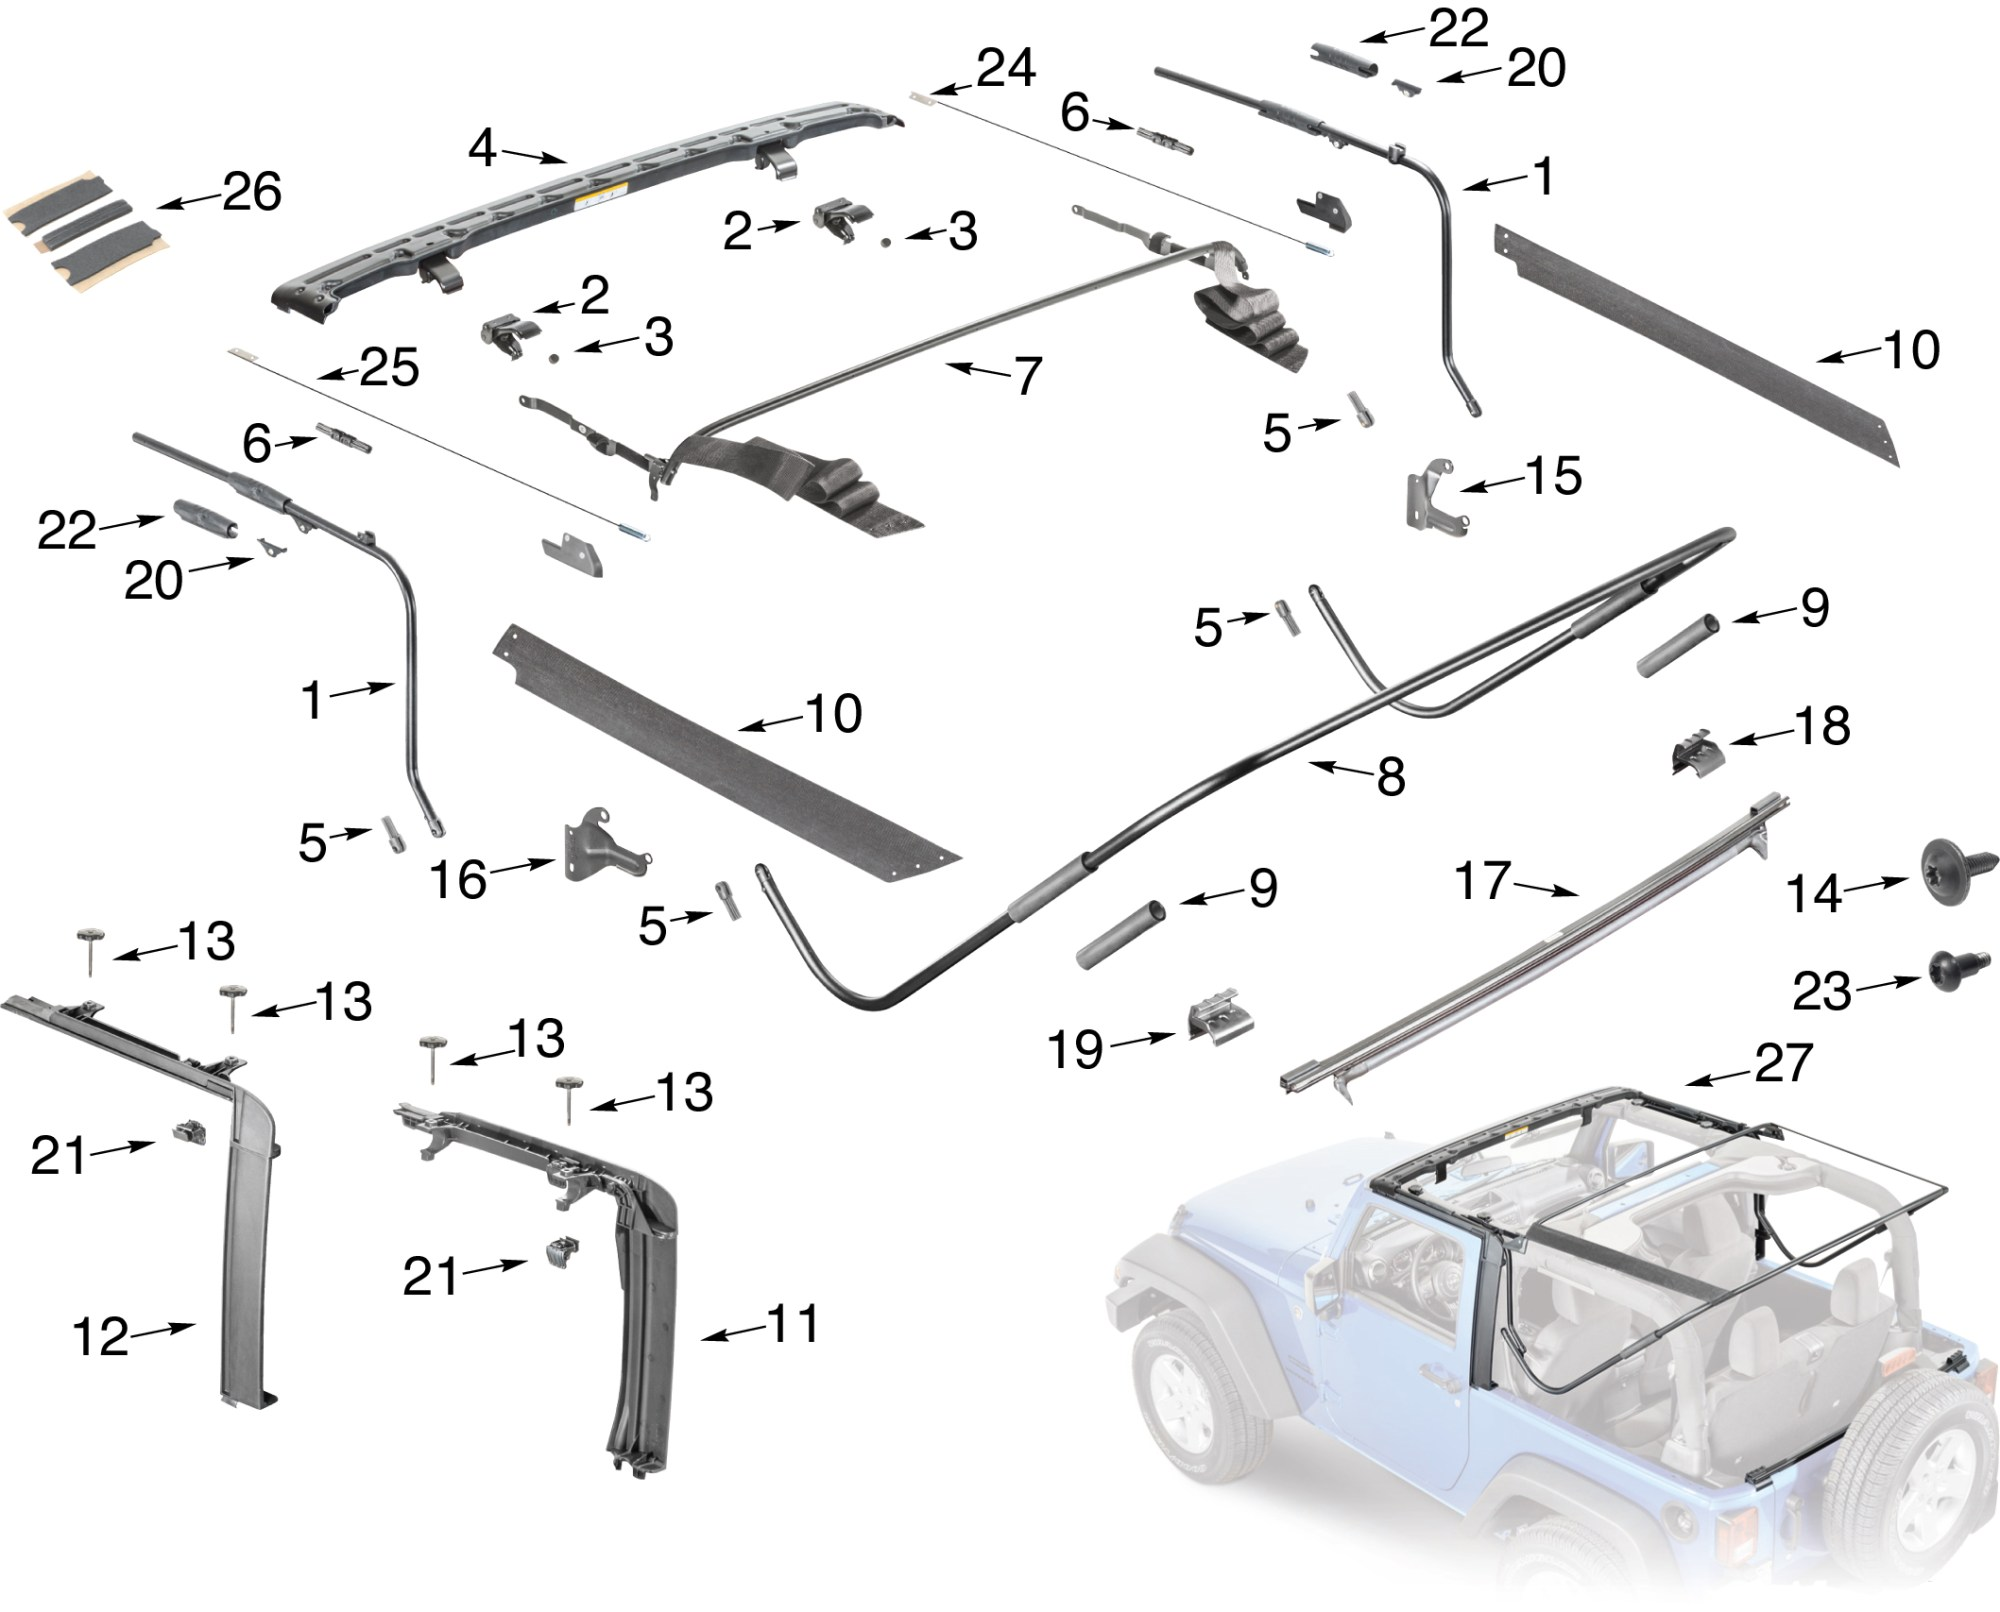 hight resolution of jeep wrangler jk soft top hardware parts